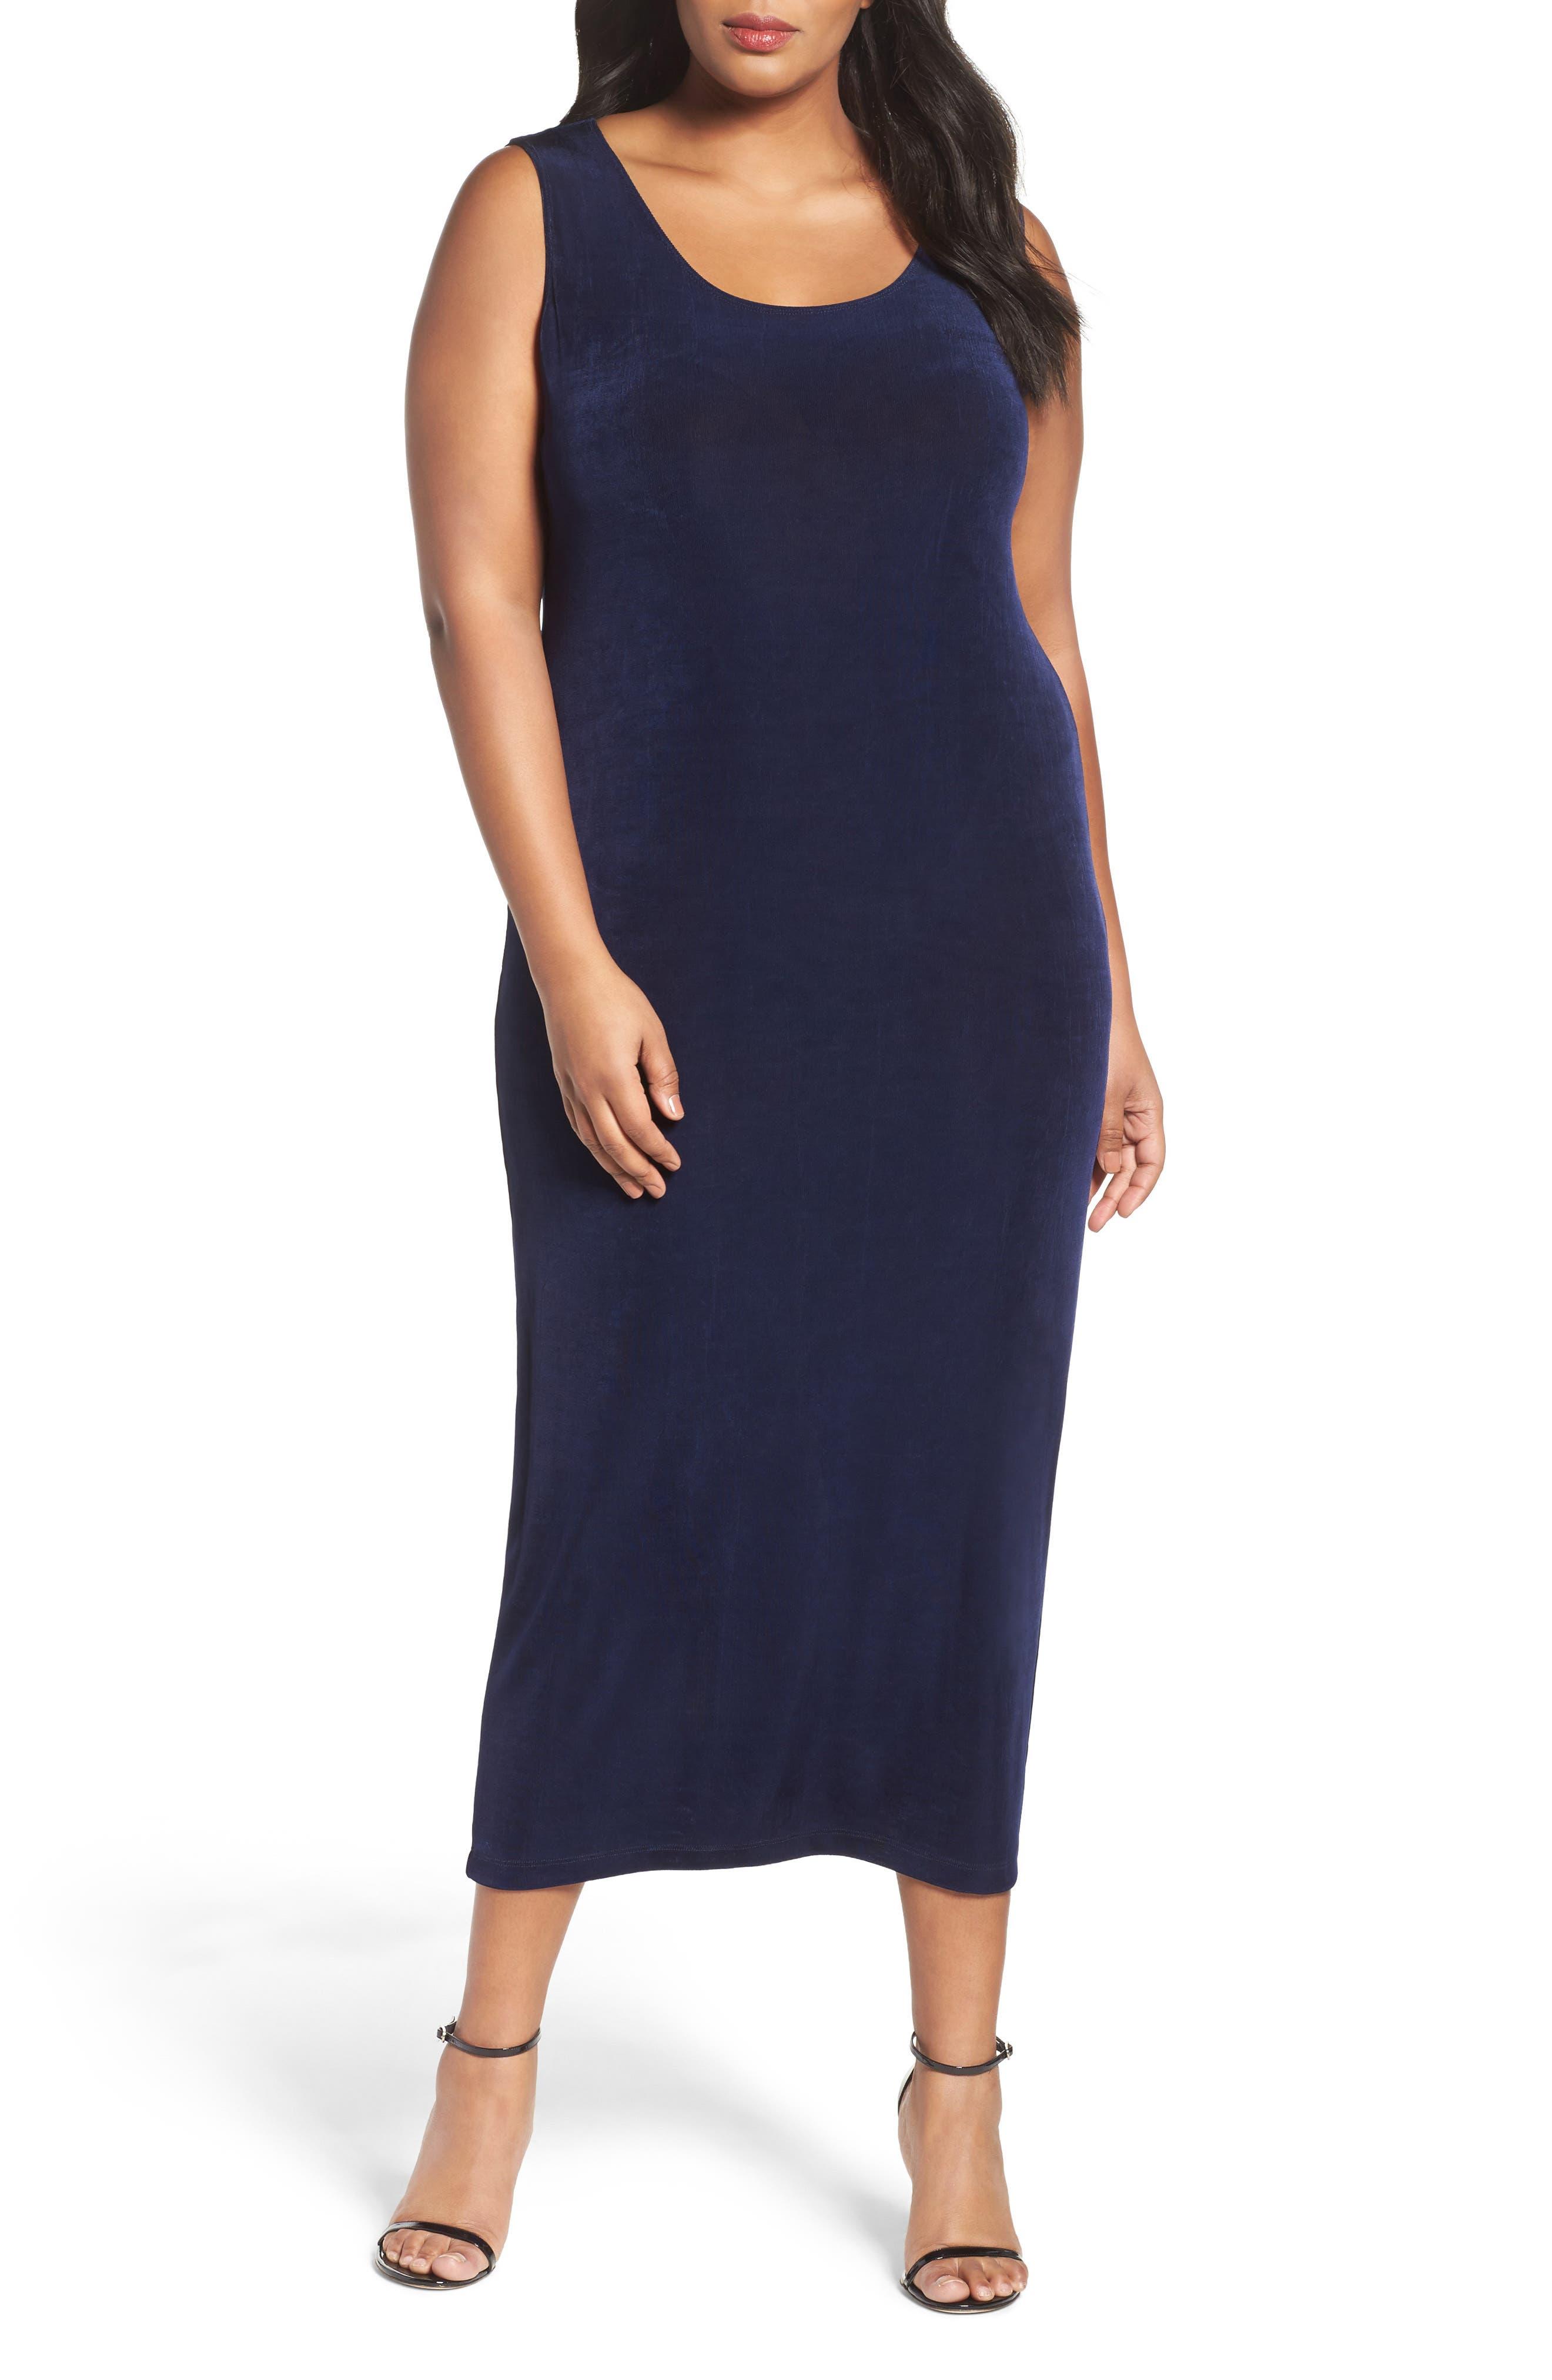 VIKKI VI Sleeveless Maxi Tank Dress, Main, color, NAVY